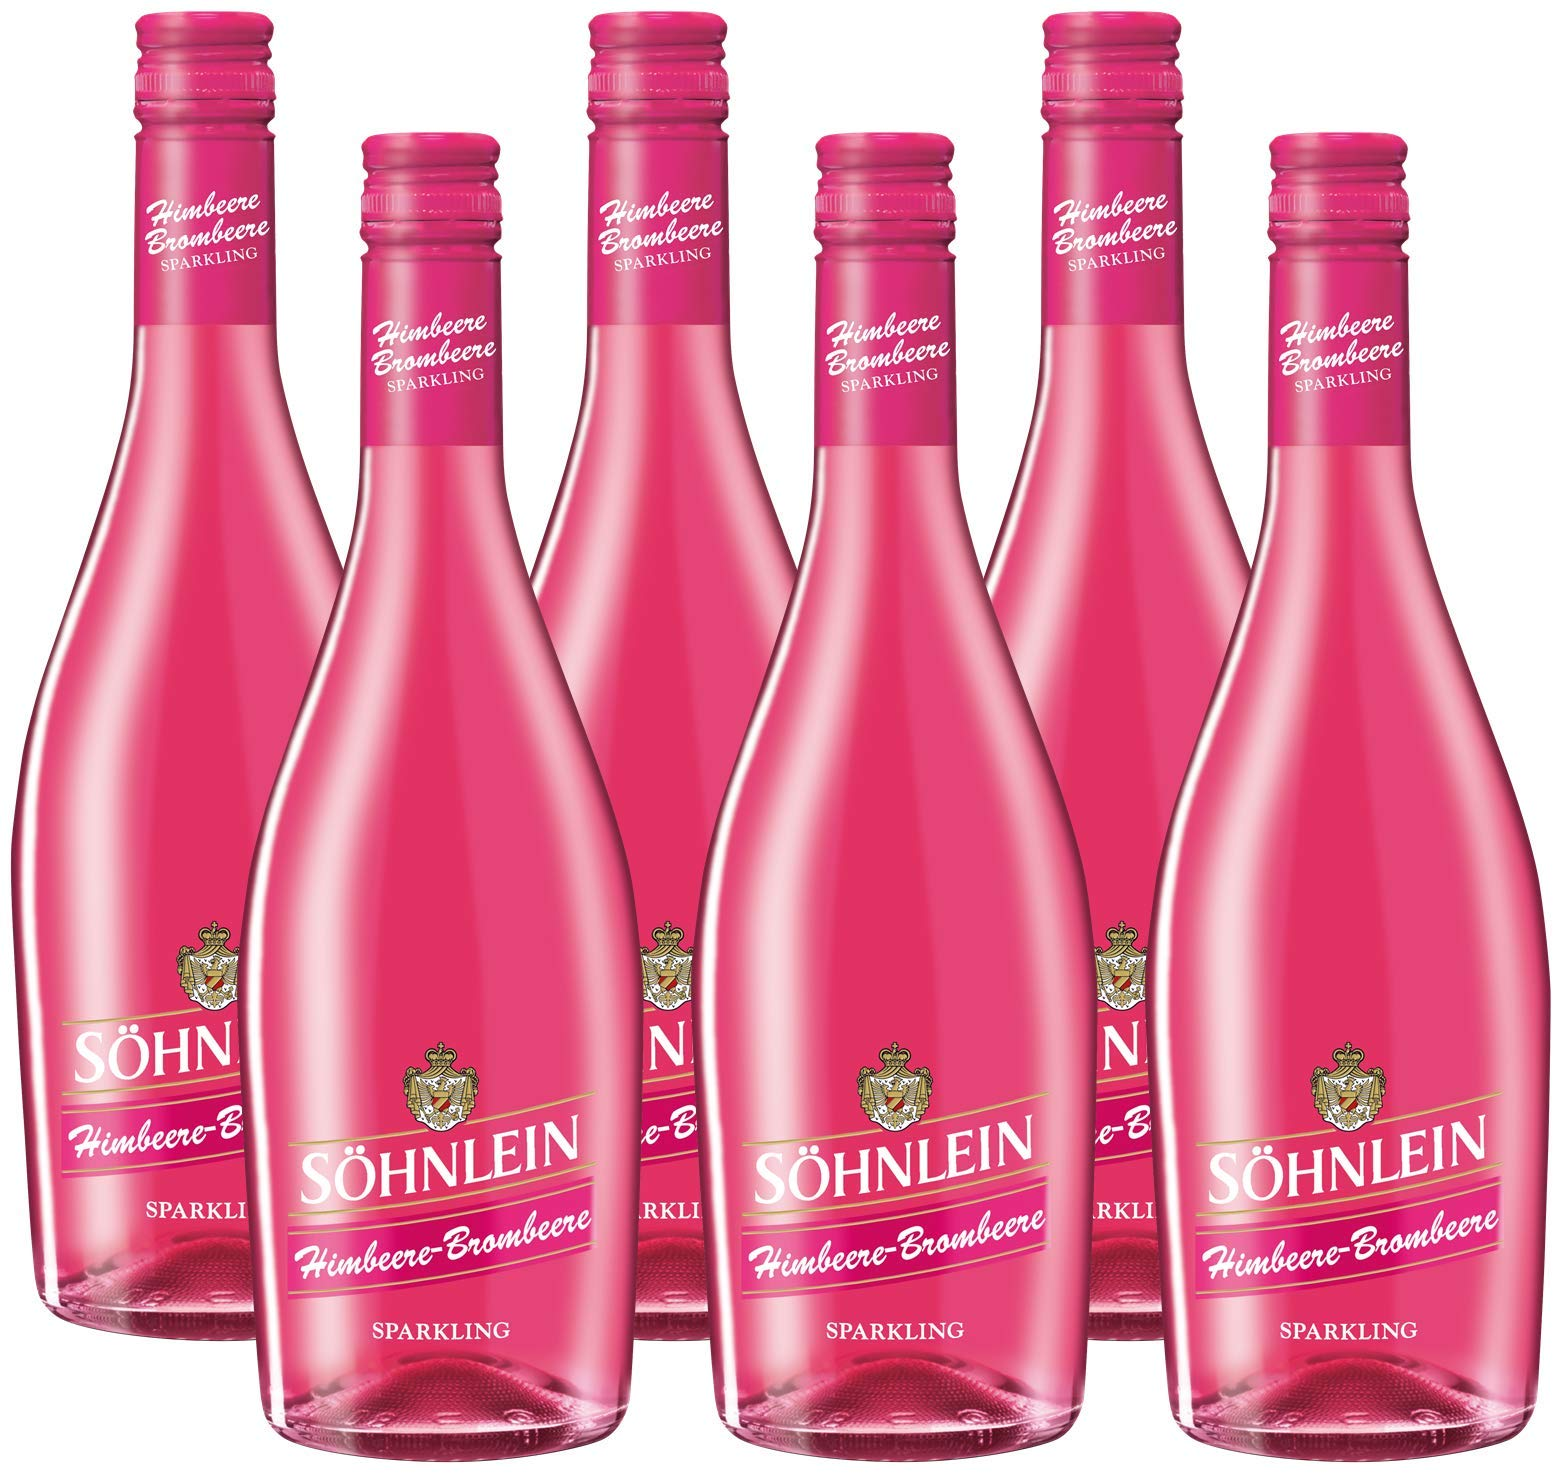 Shnlein-Brillant-Sparkling-6-x-075-l